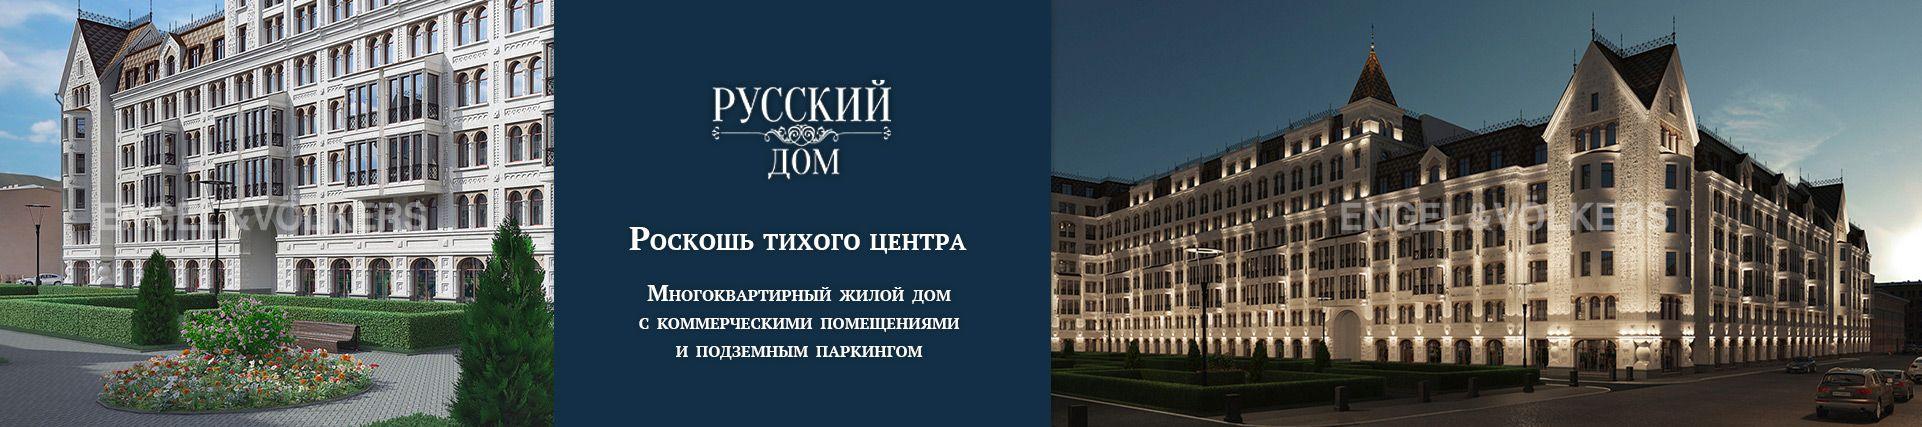 https://evspb.ru/wp-content/uploads/2018/05/banner_russHouse.jpg